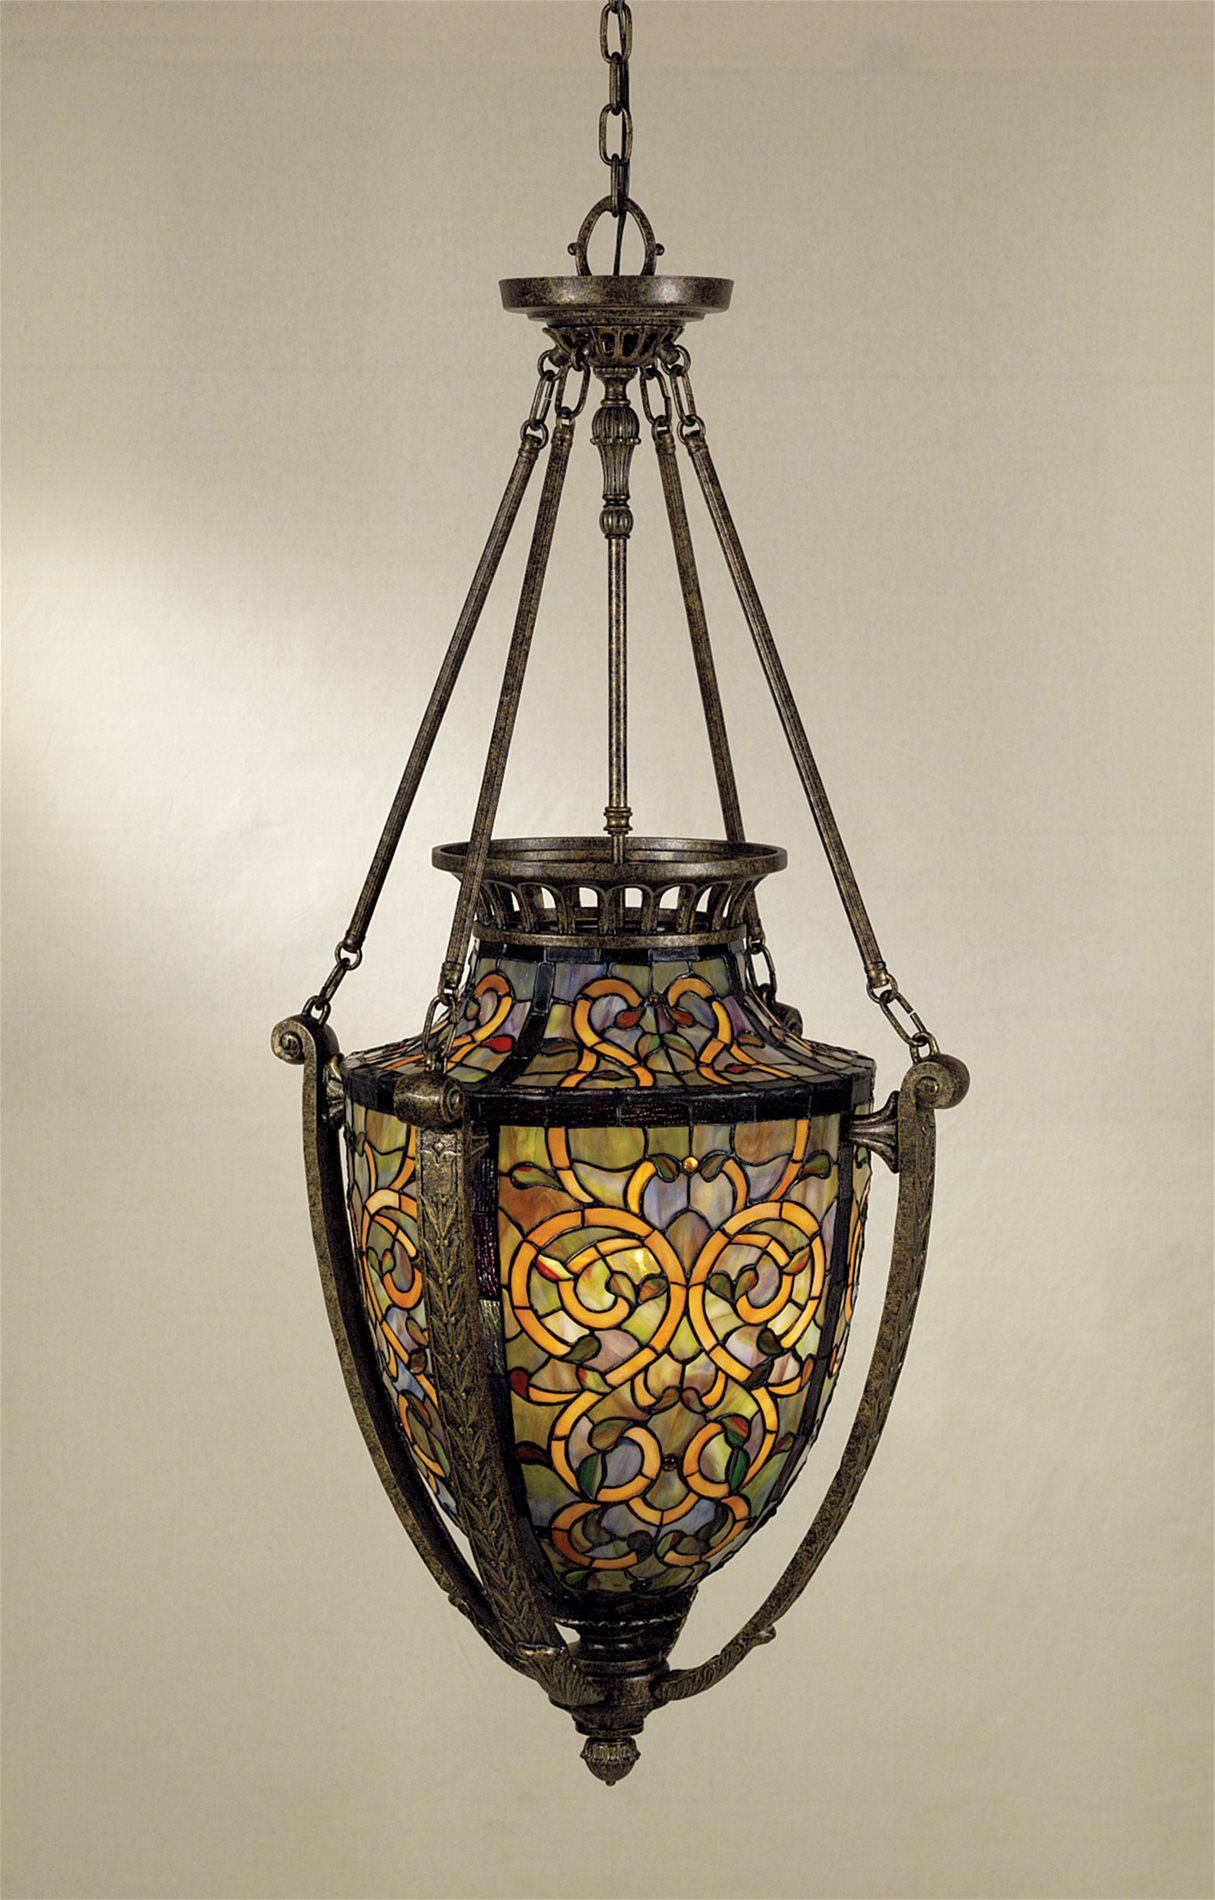 Quoizel Tf1721ml Anfora Traditional Tiffany Pendant Light